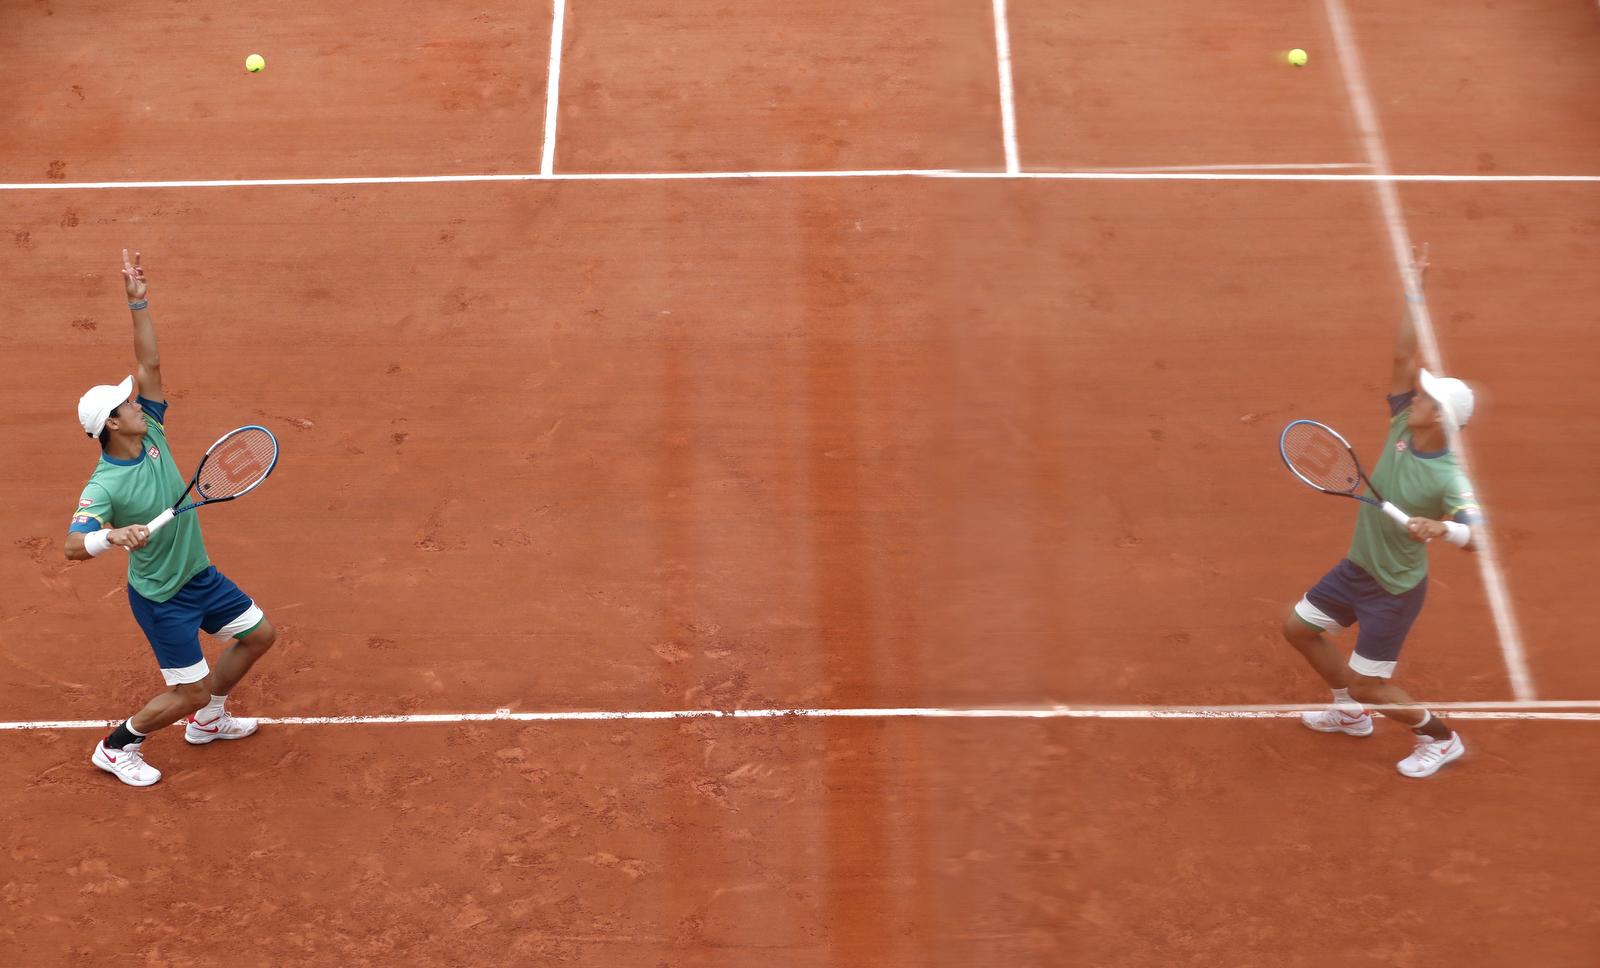 Japan's Kei Nishikori in action during his third round match against Switzerland's Henri Laaksonen at Roland Garros in Paris, France, June 4. REUTERS